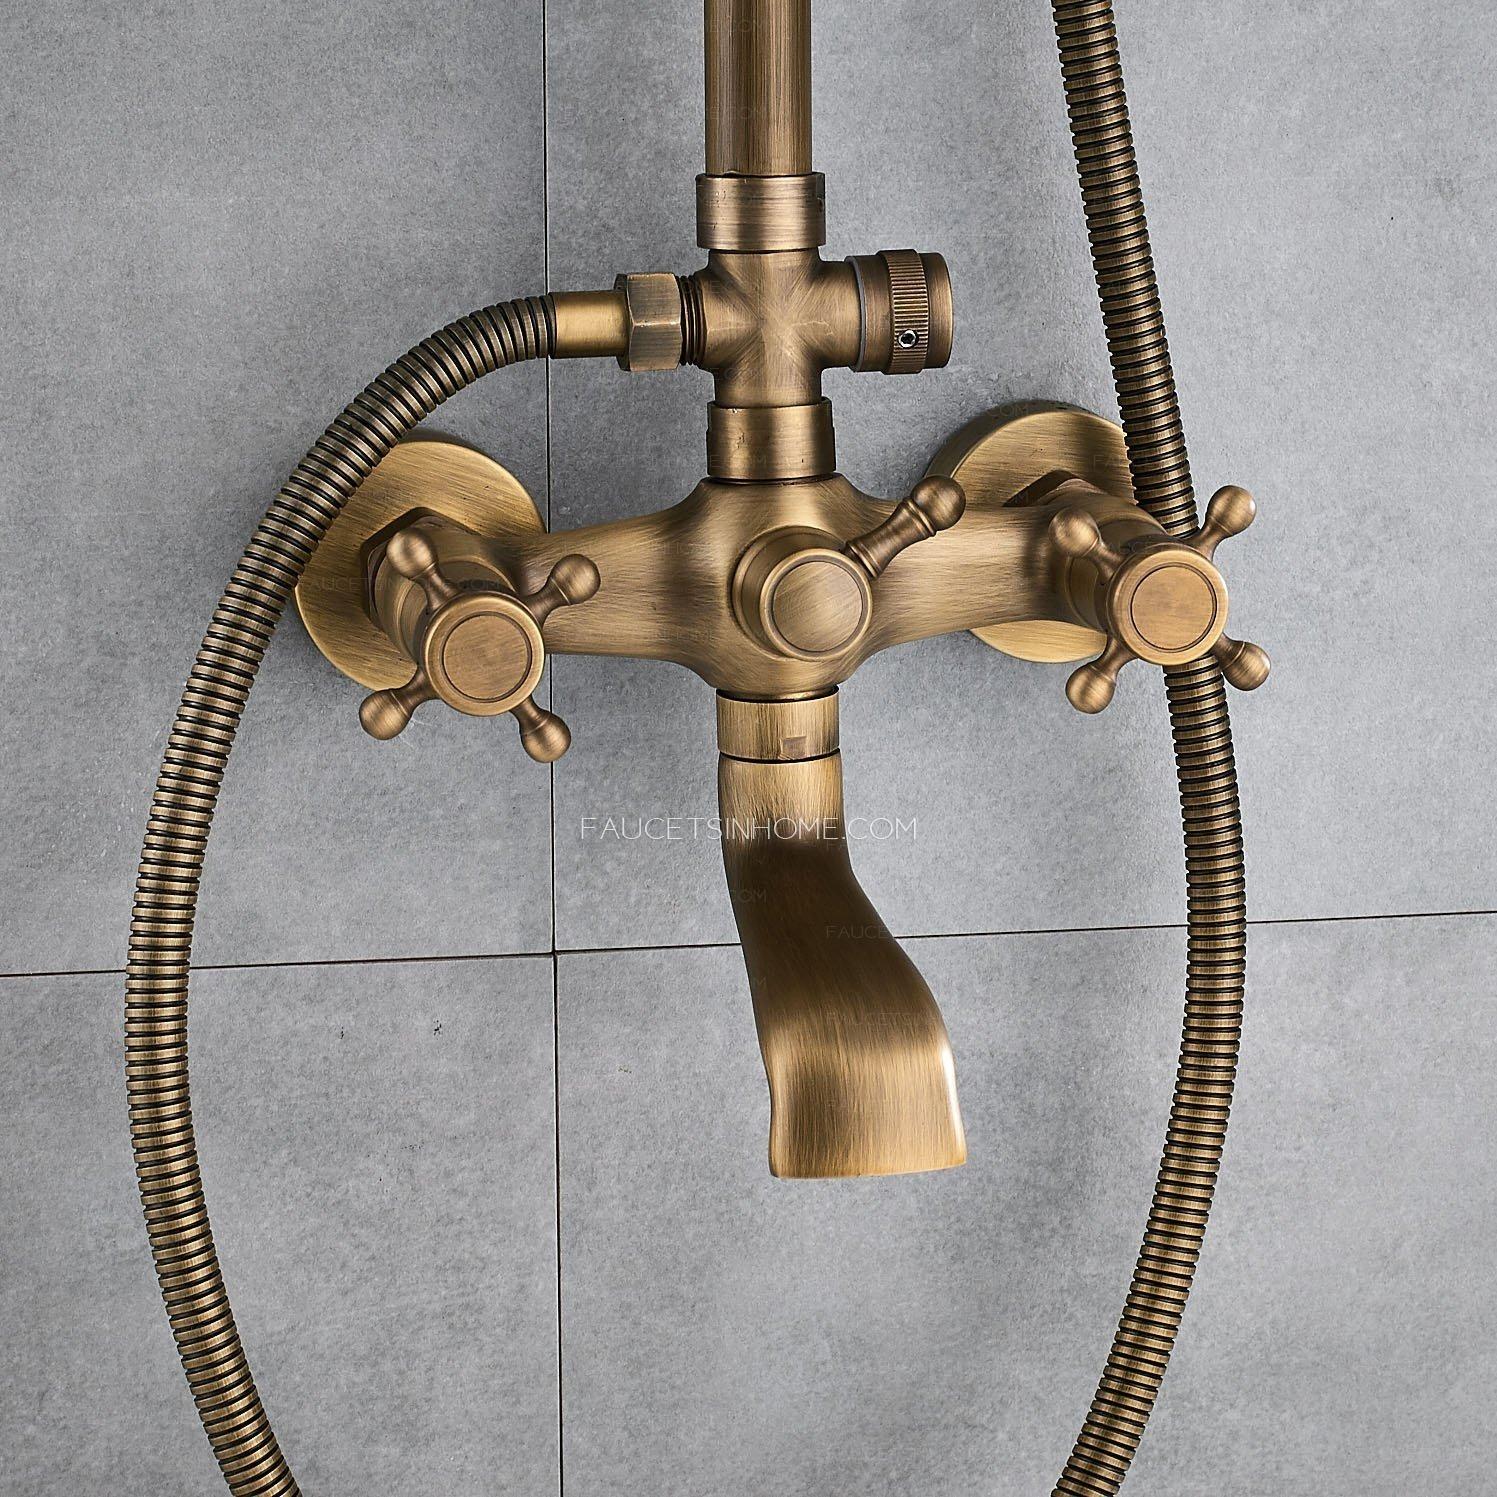 Antique Brass Shower Faucet Brushed Gold Rainfall Shower Head Fth1804250917457